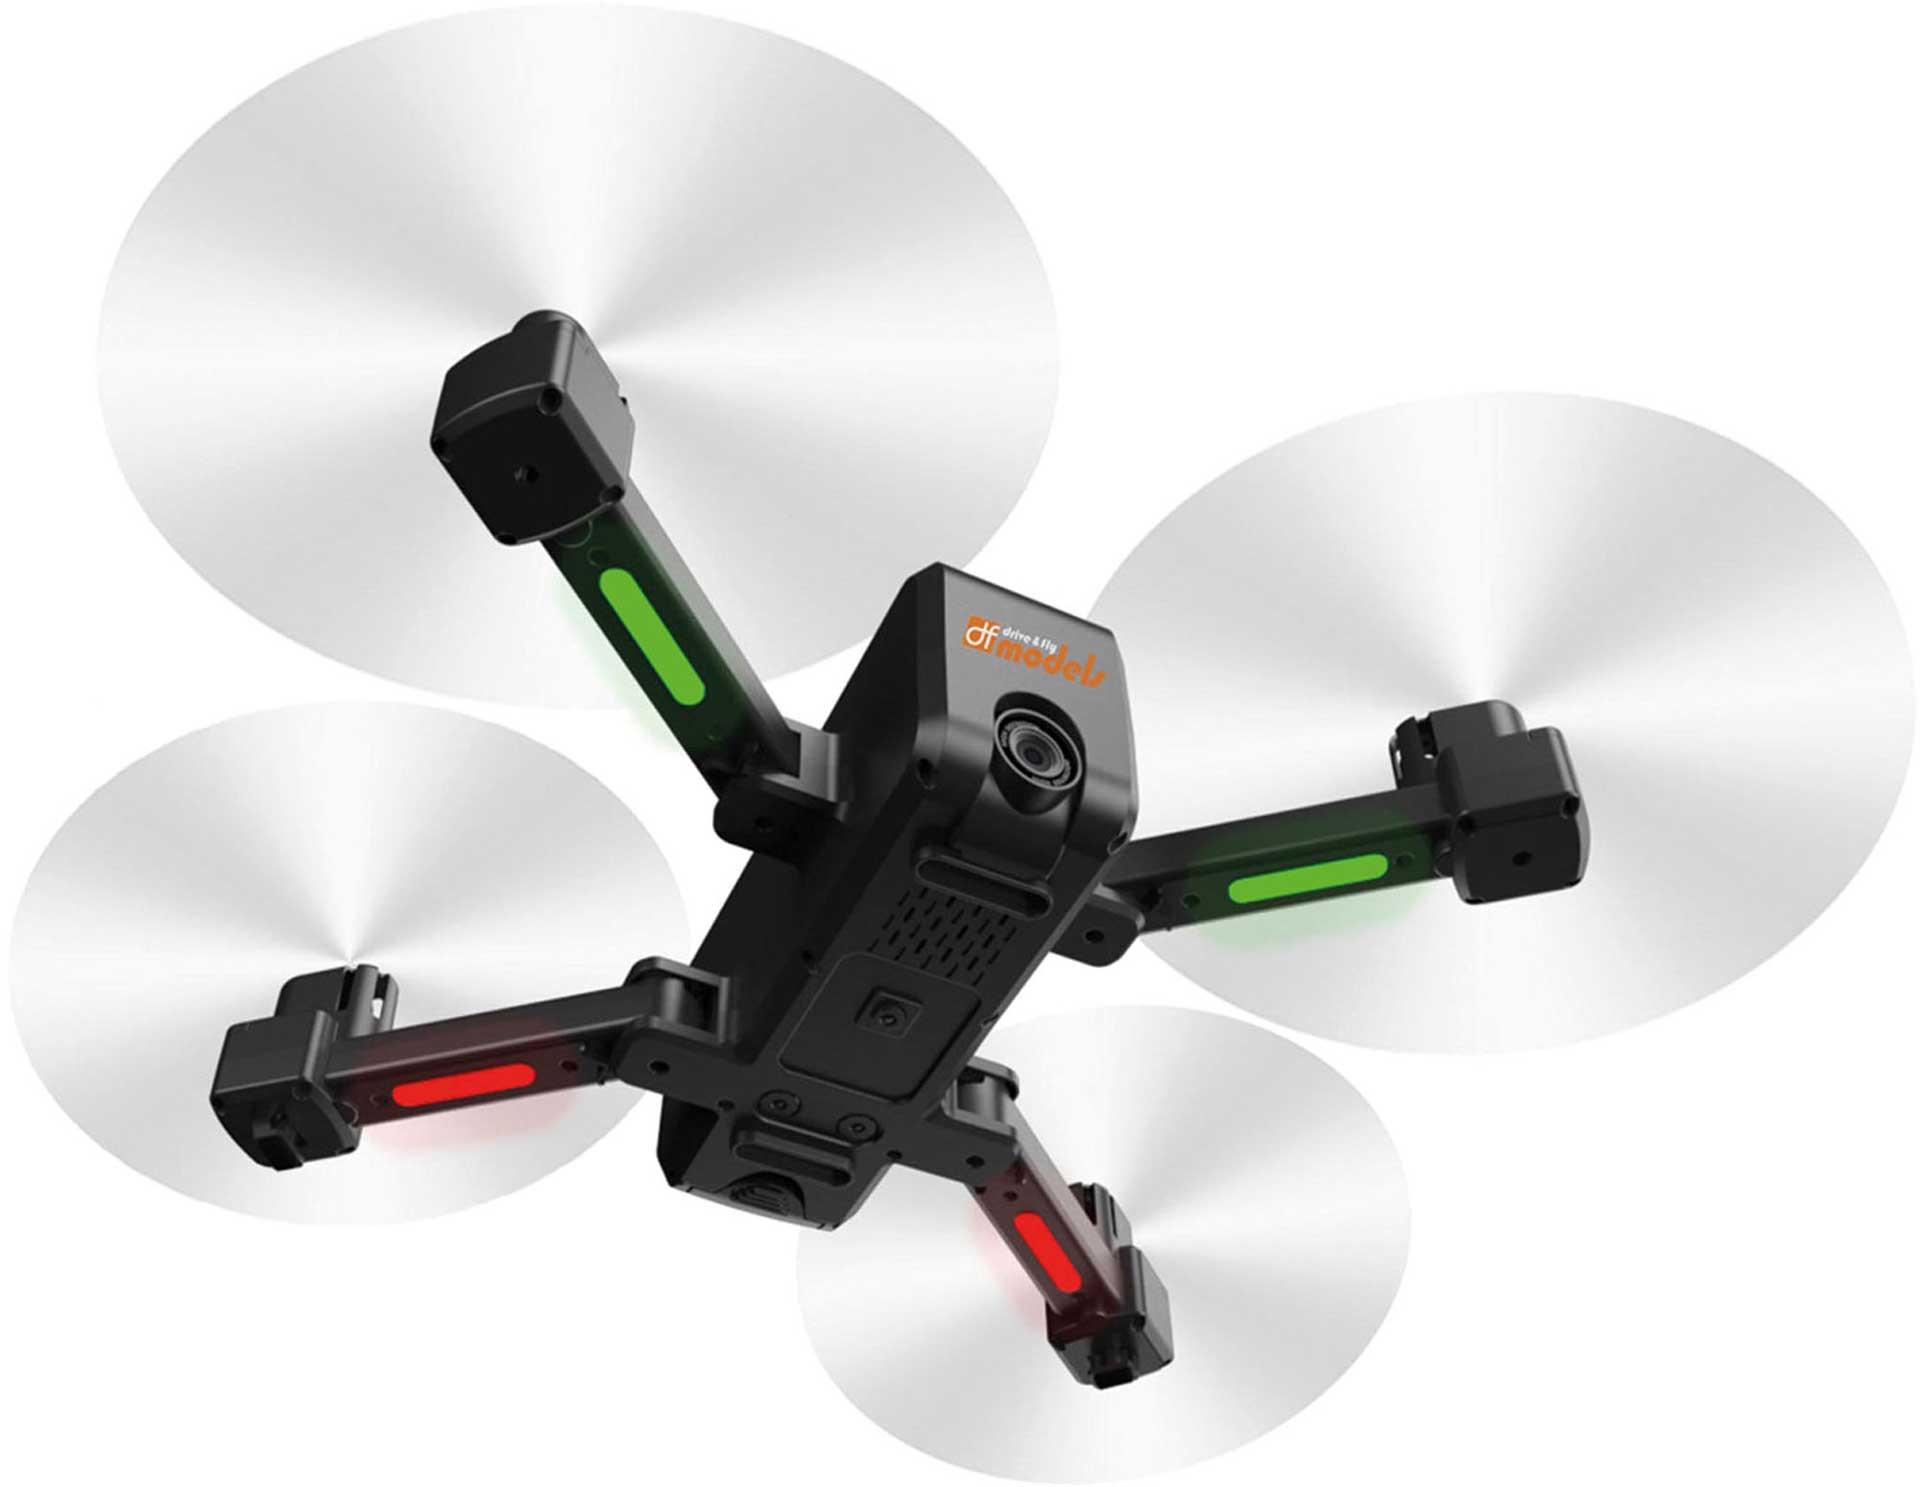 DRIVE & FLY MODELS SKY WATCHER GPS PRO